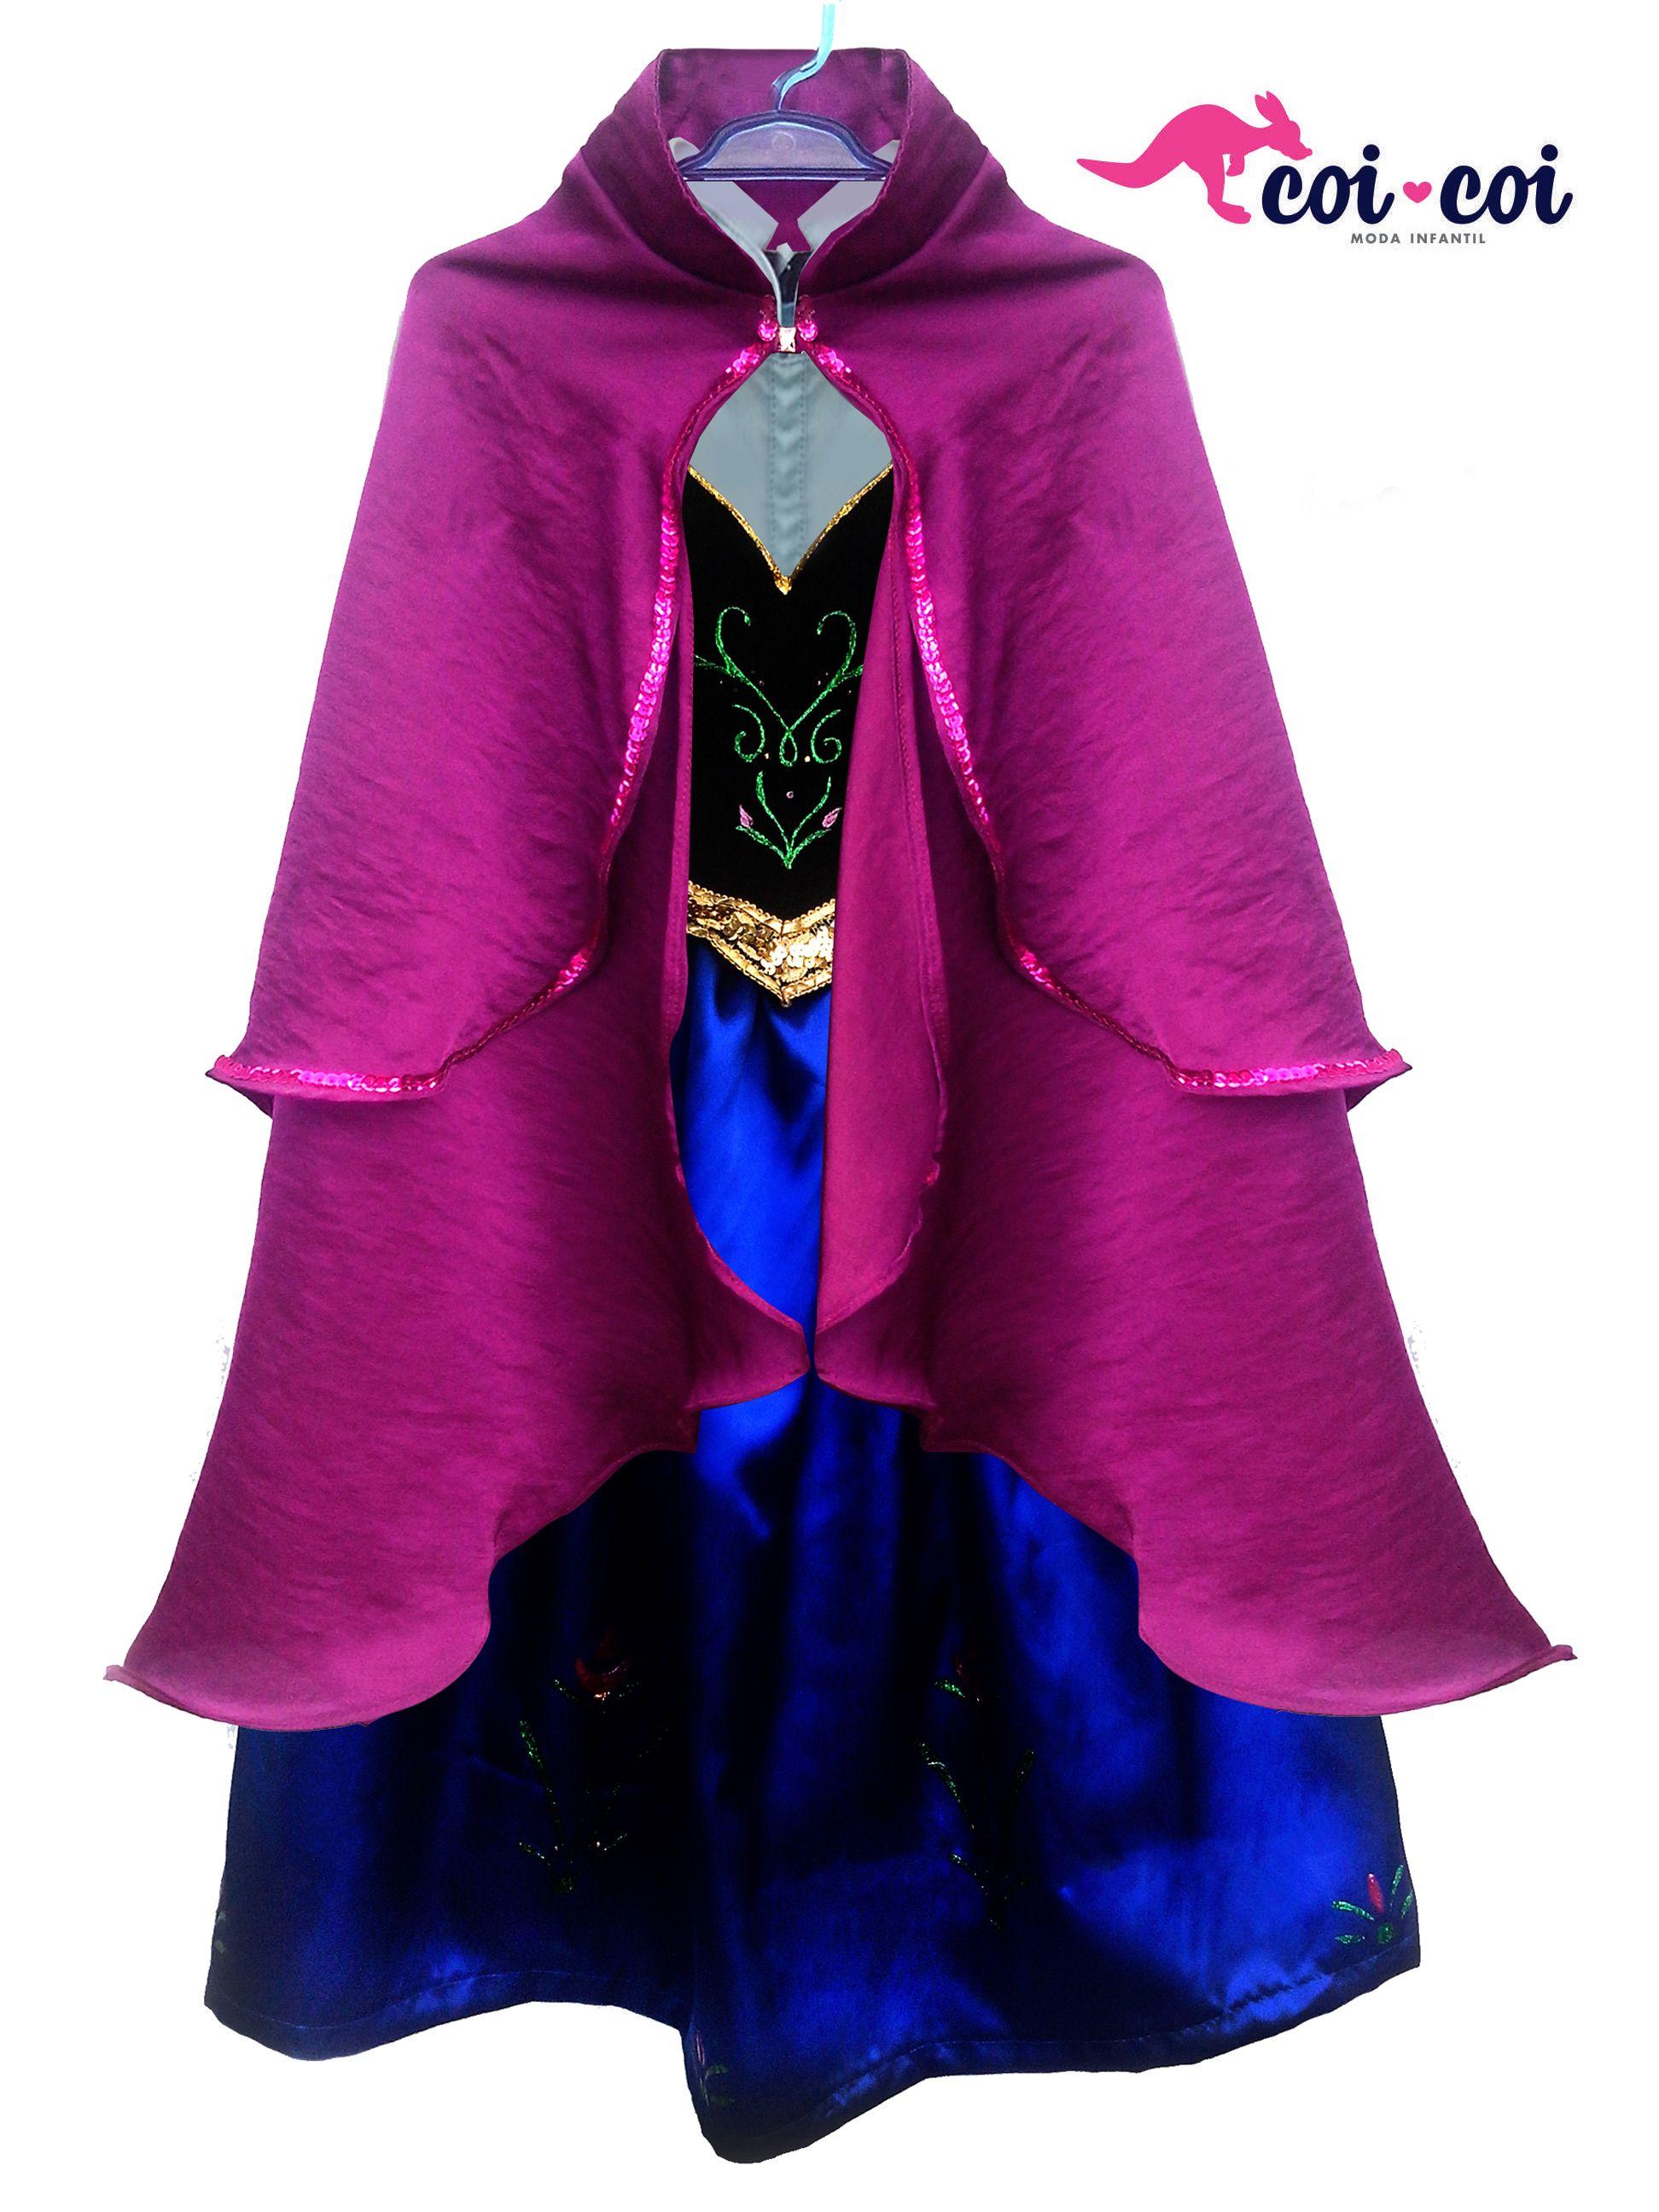 Vestido Infantil Anna, Frozen. | Vestidos | Pinterest | Ropa y ...